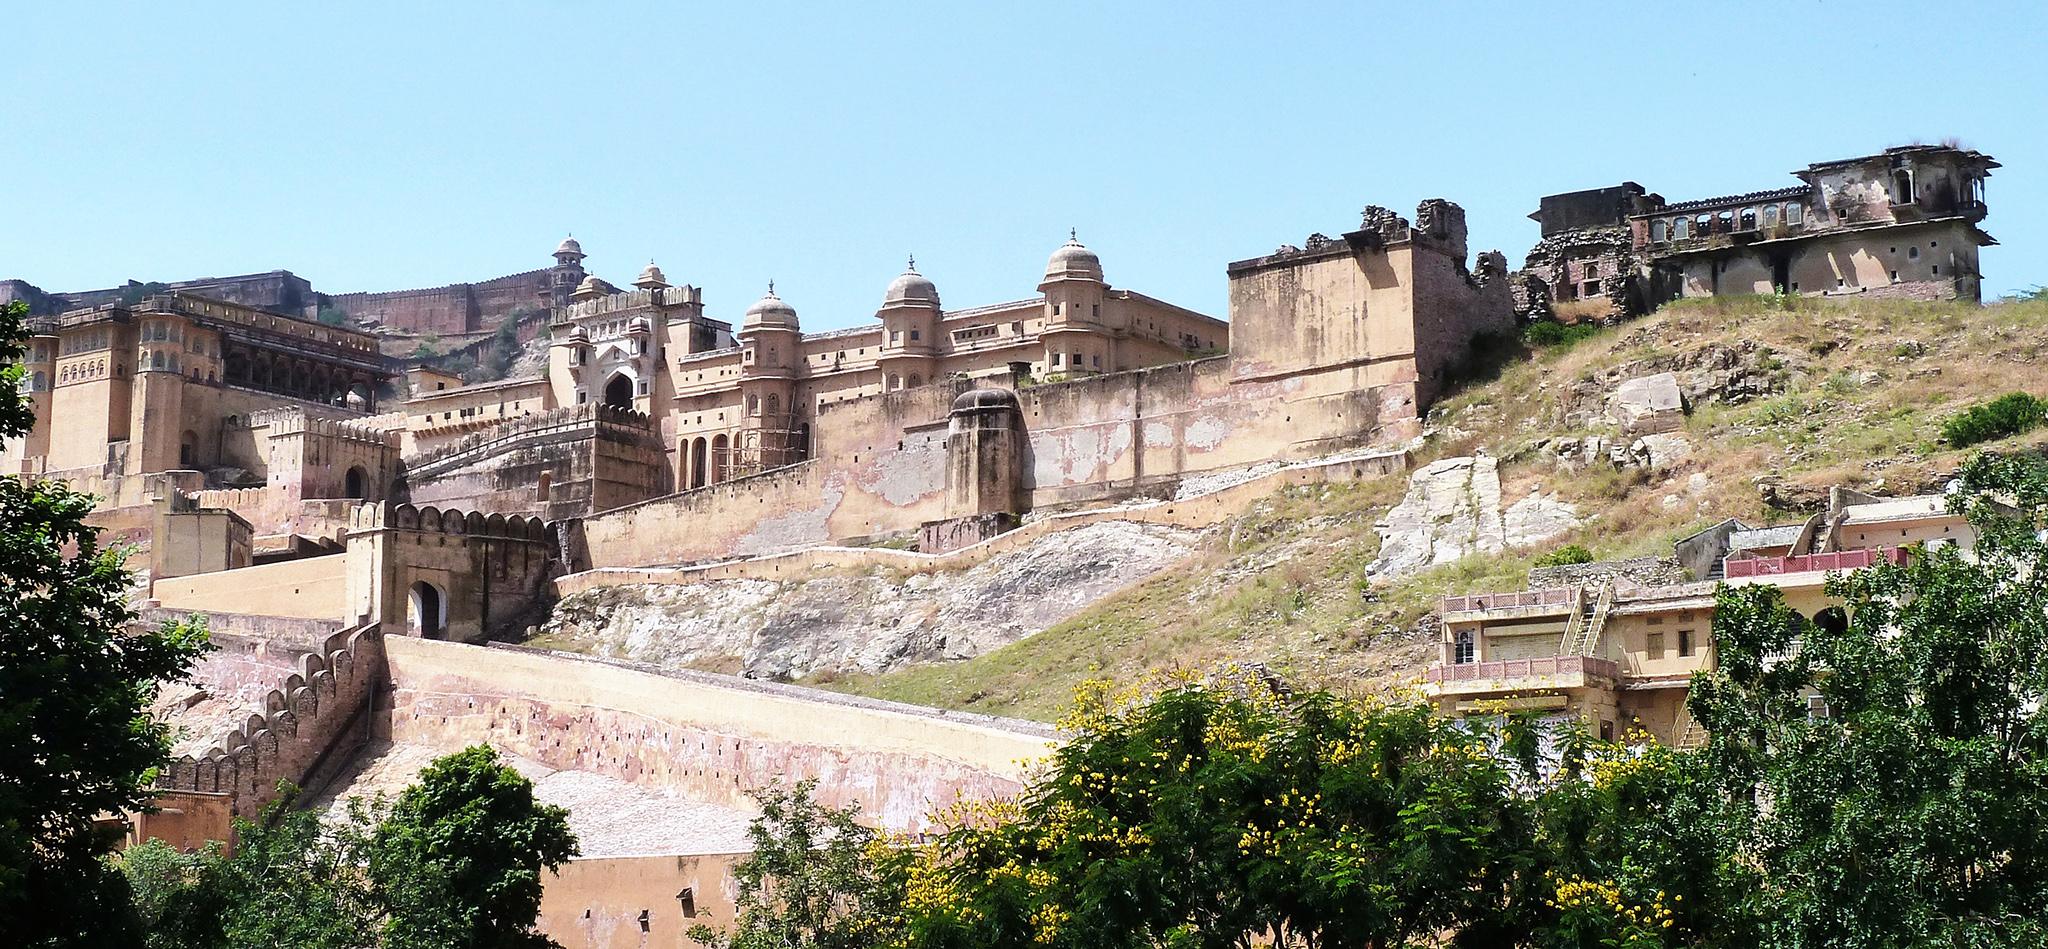 Amber fort près d'Agra